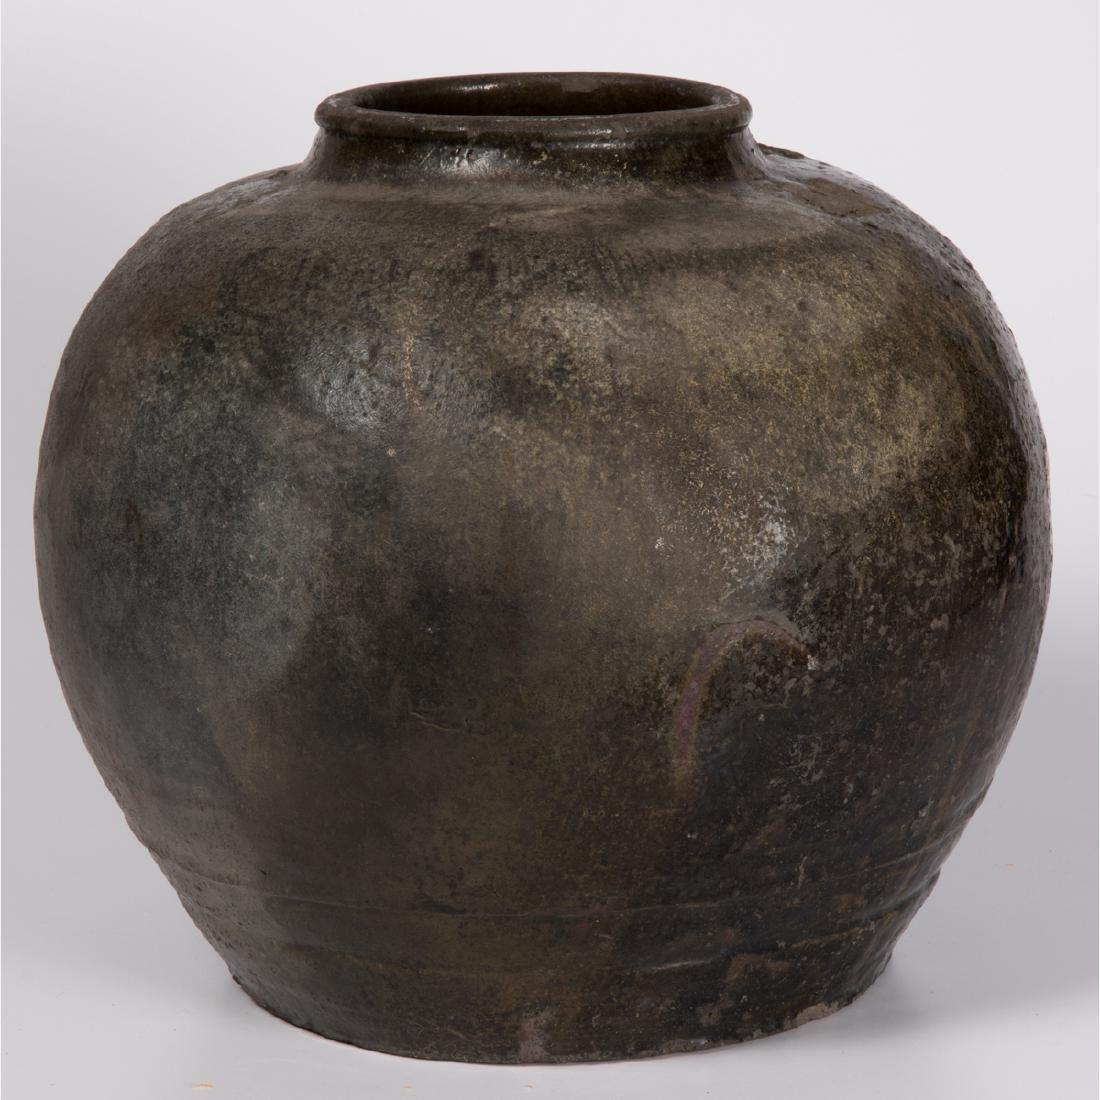 A Chinese Archaic Style Stoneware Storage Vessel.